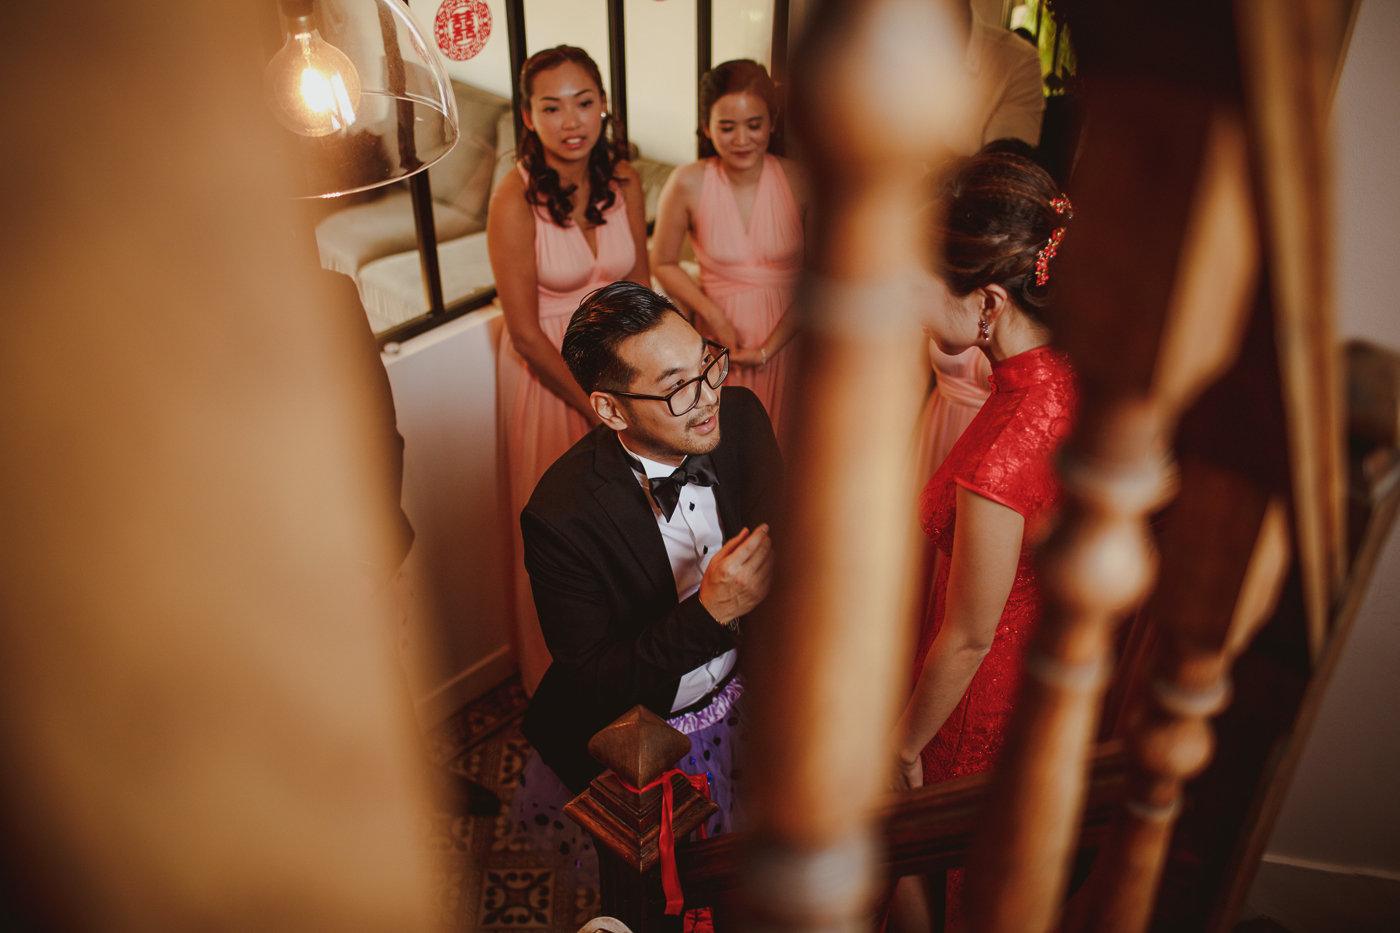 destination_wedding_photography_in_france-7.jpg